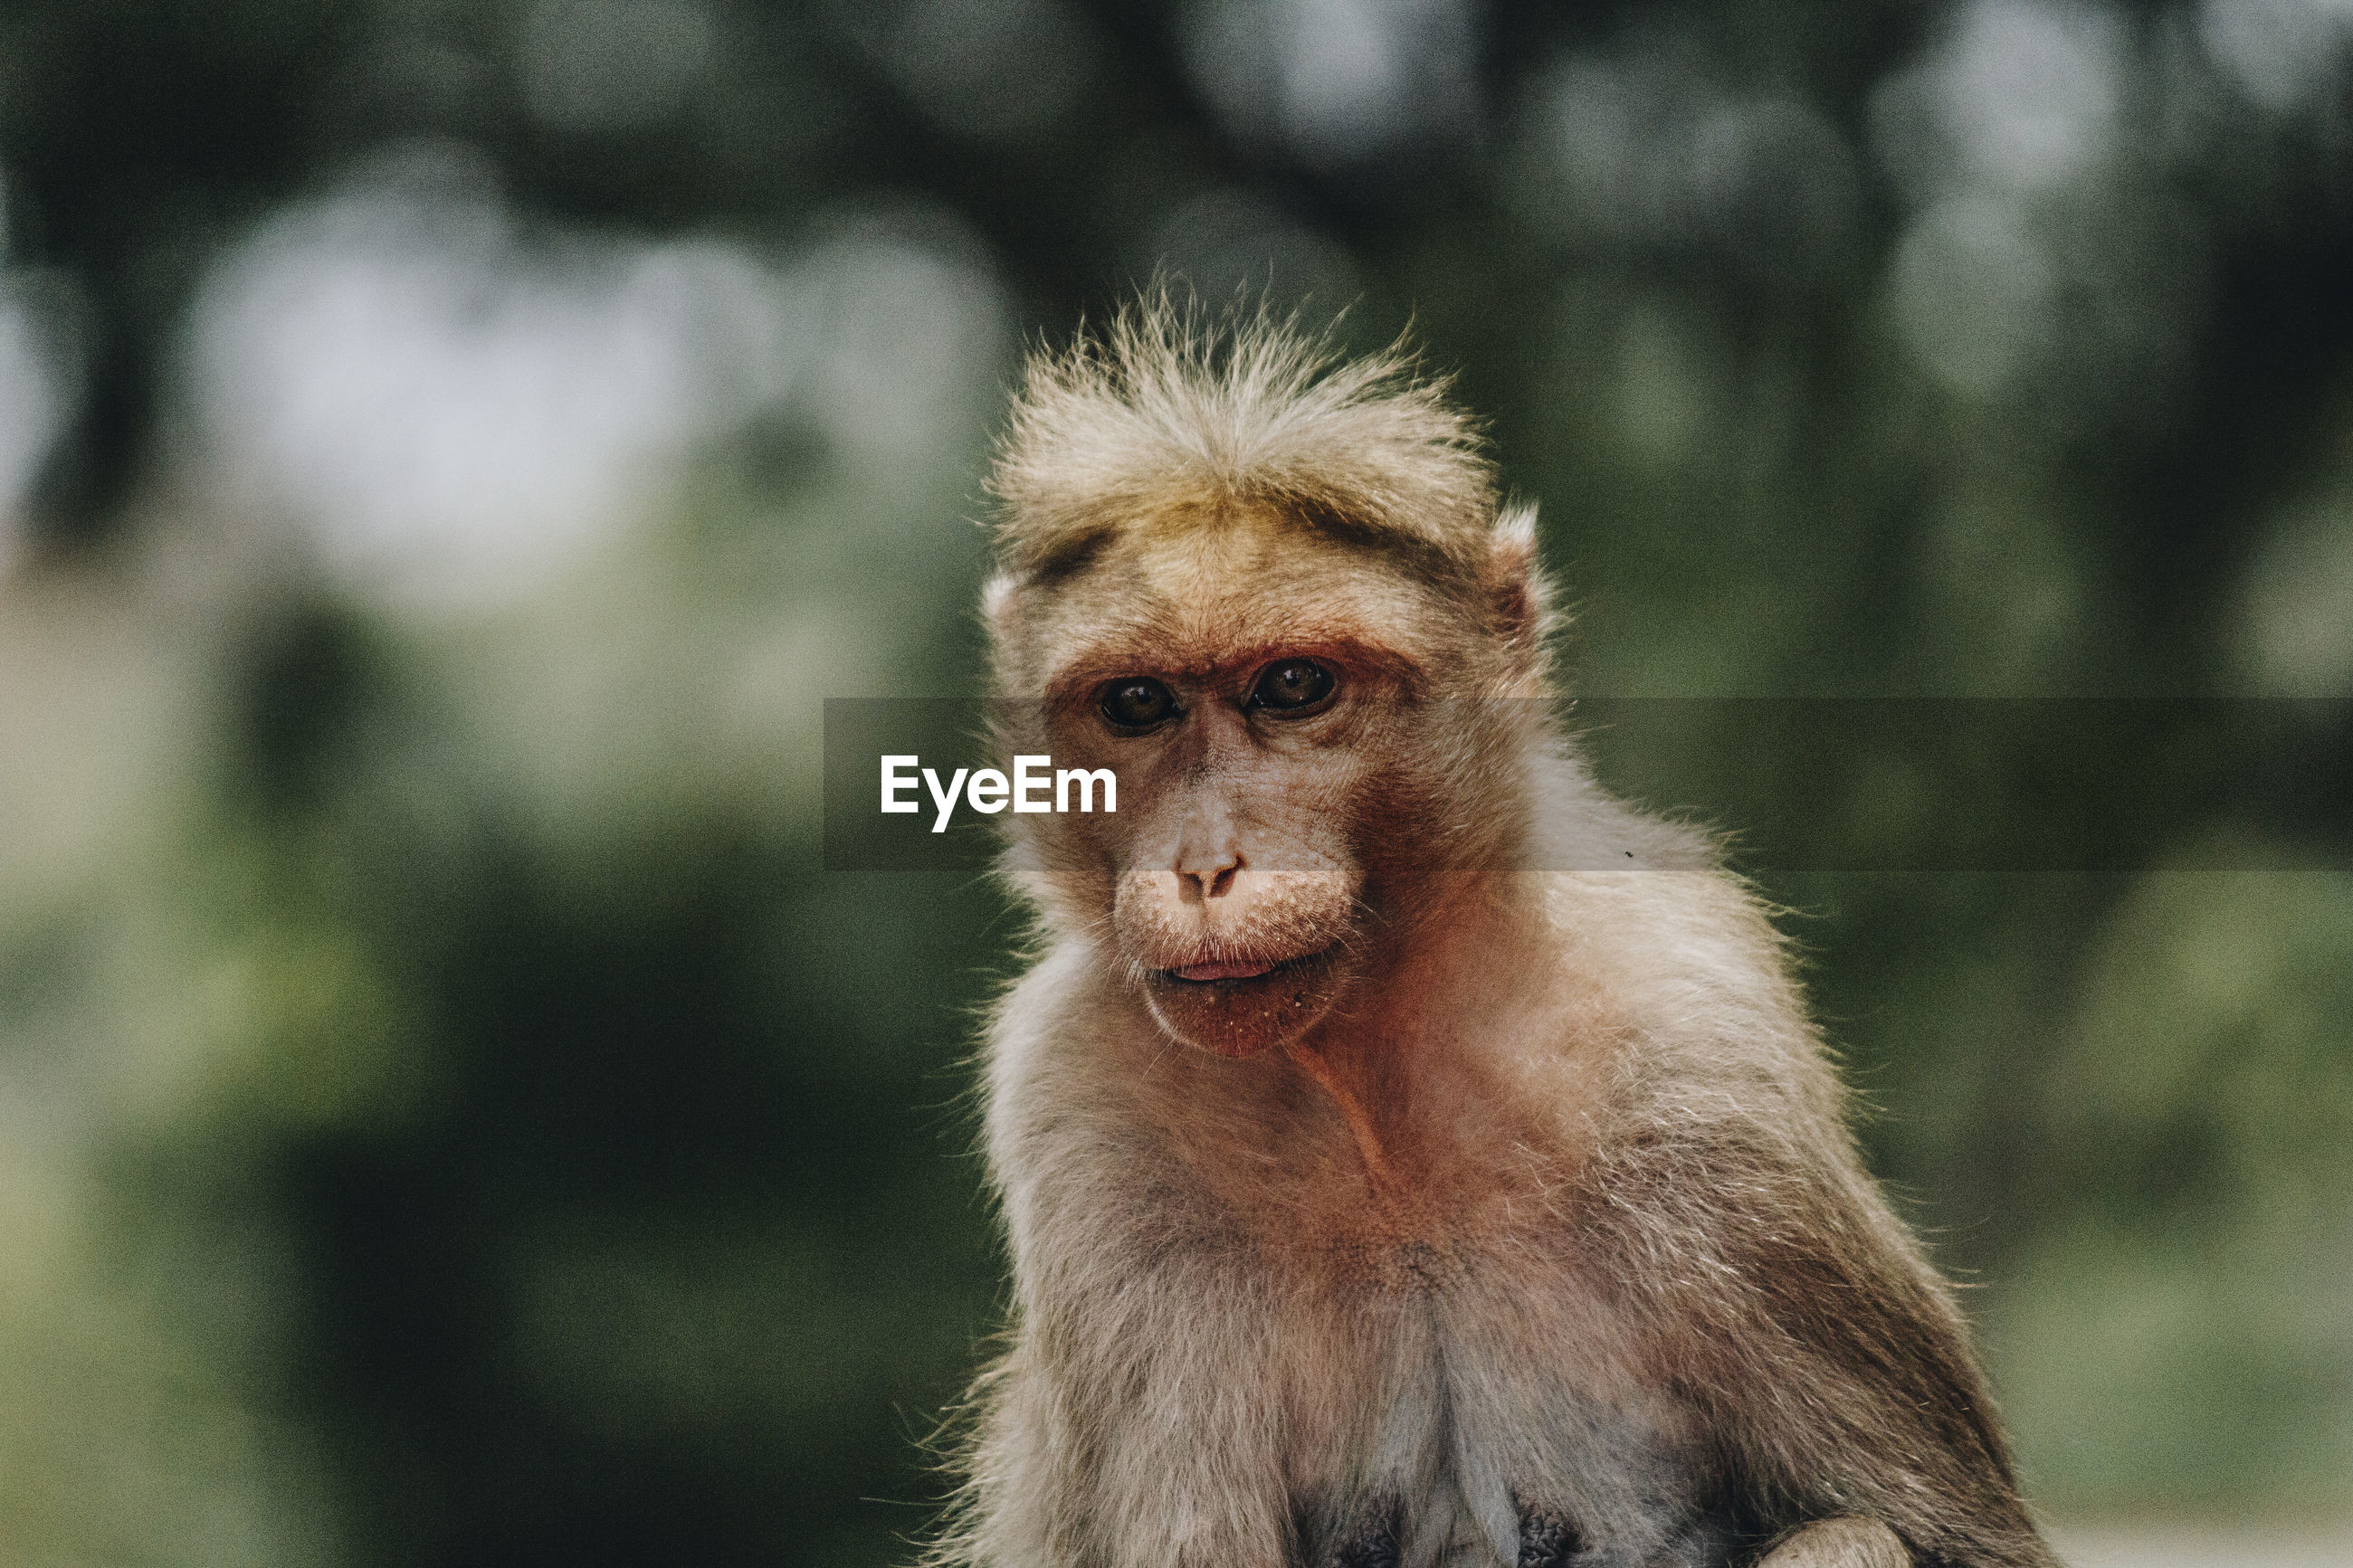 Close-up portrait of monkey